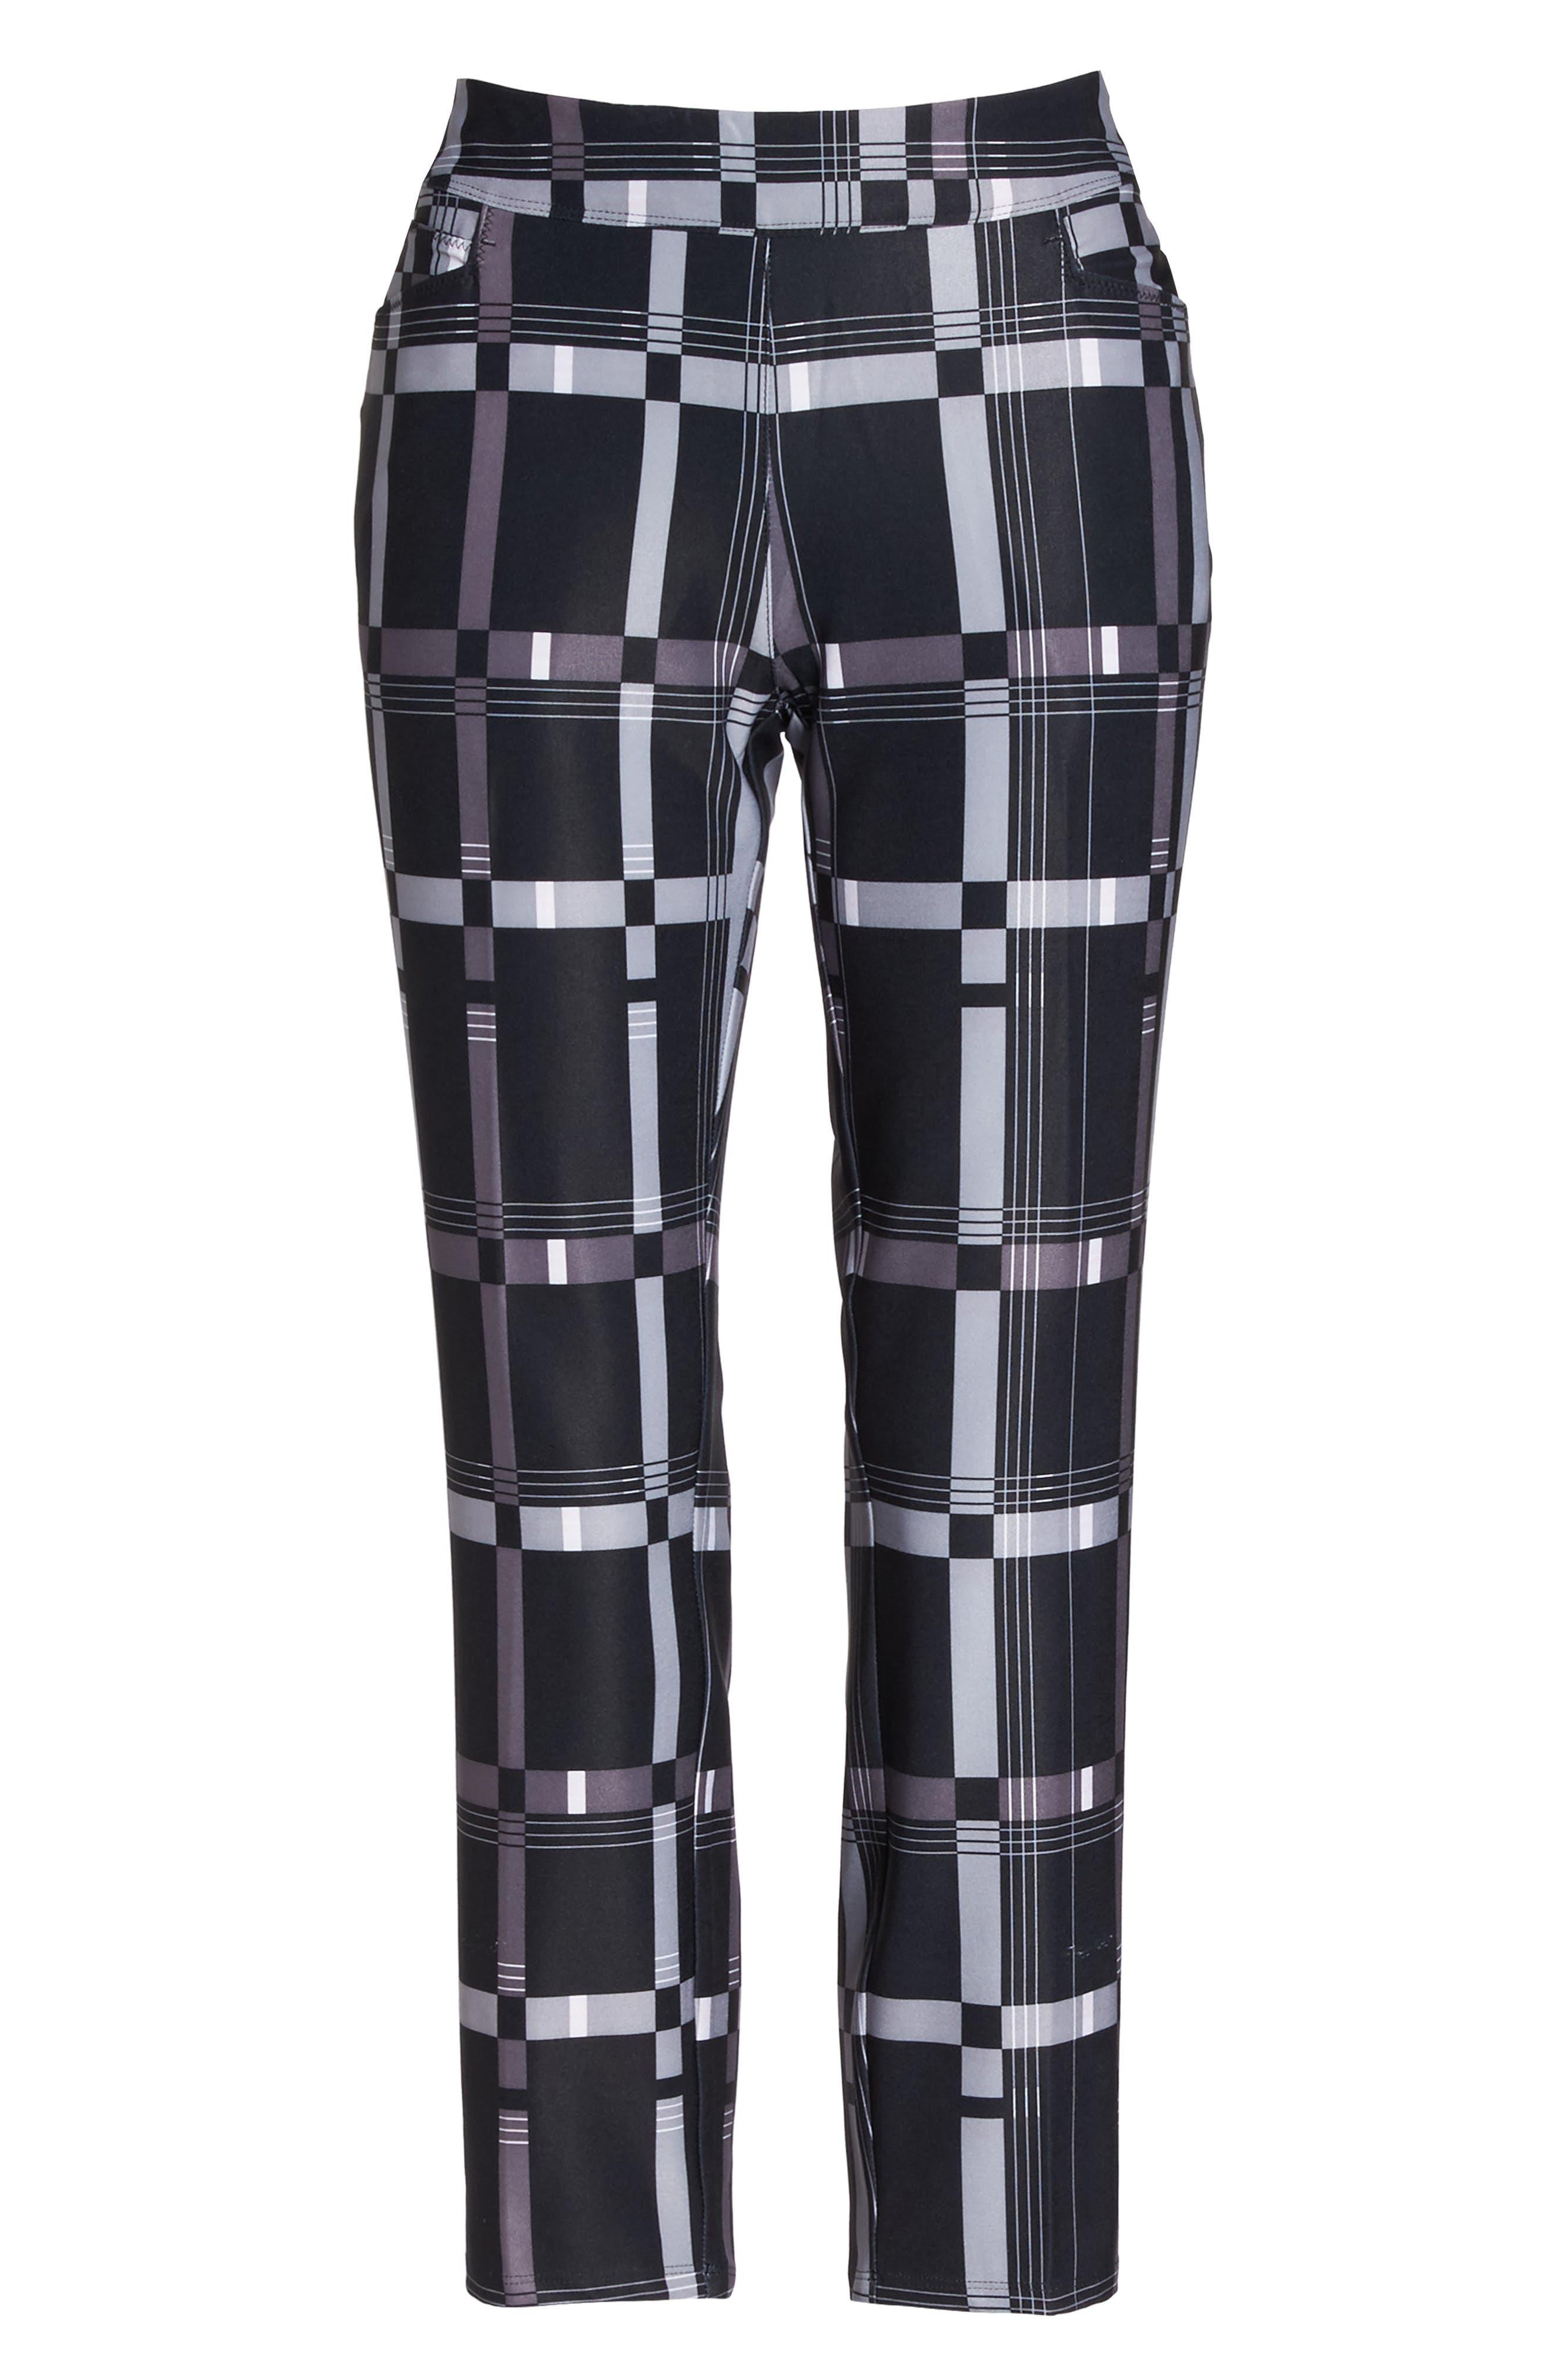 adistar Ankle Pants,                             Alternate thumbnail 7, color,                             Black